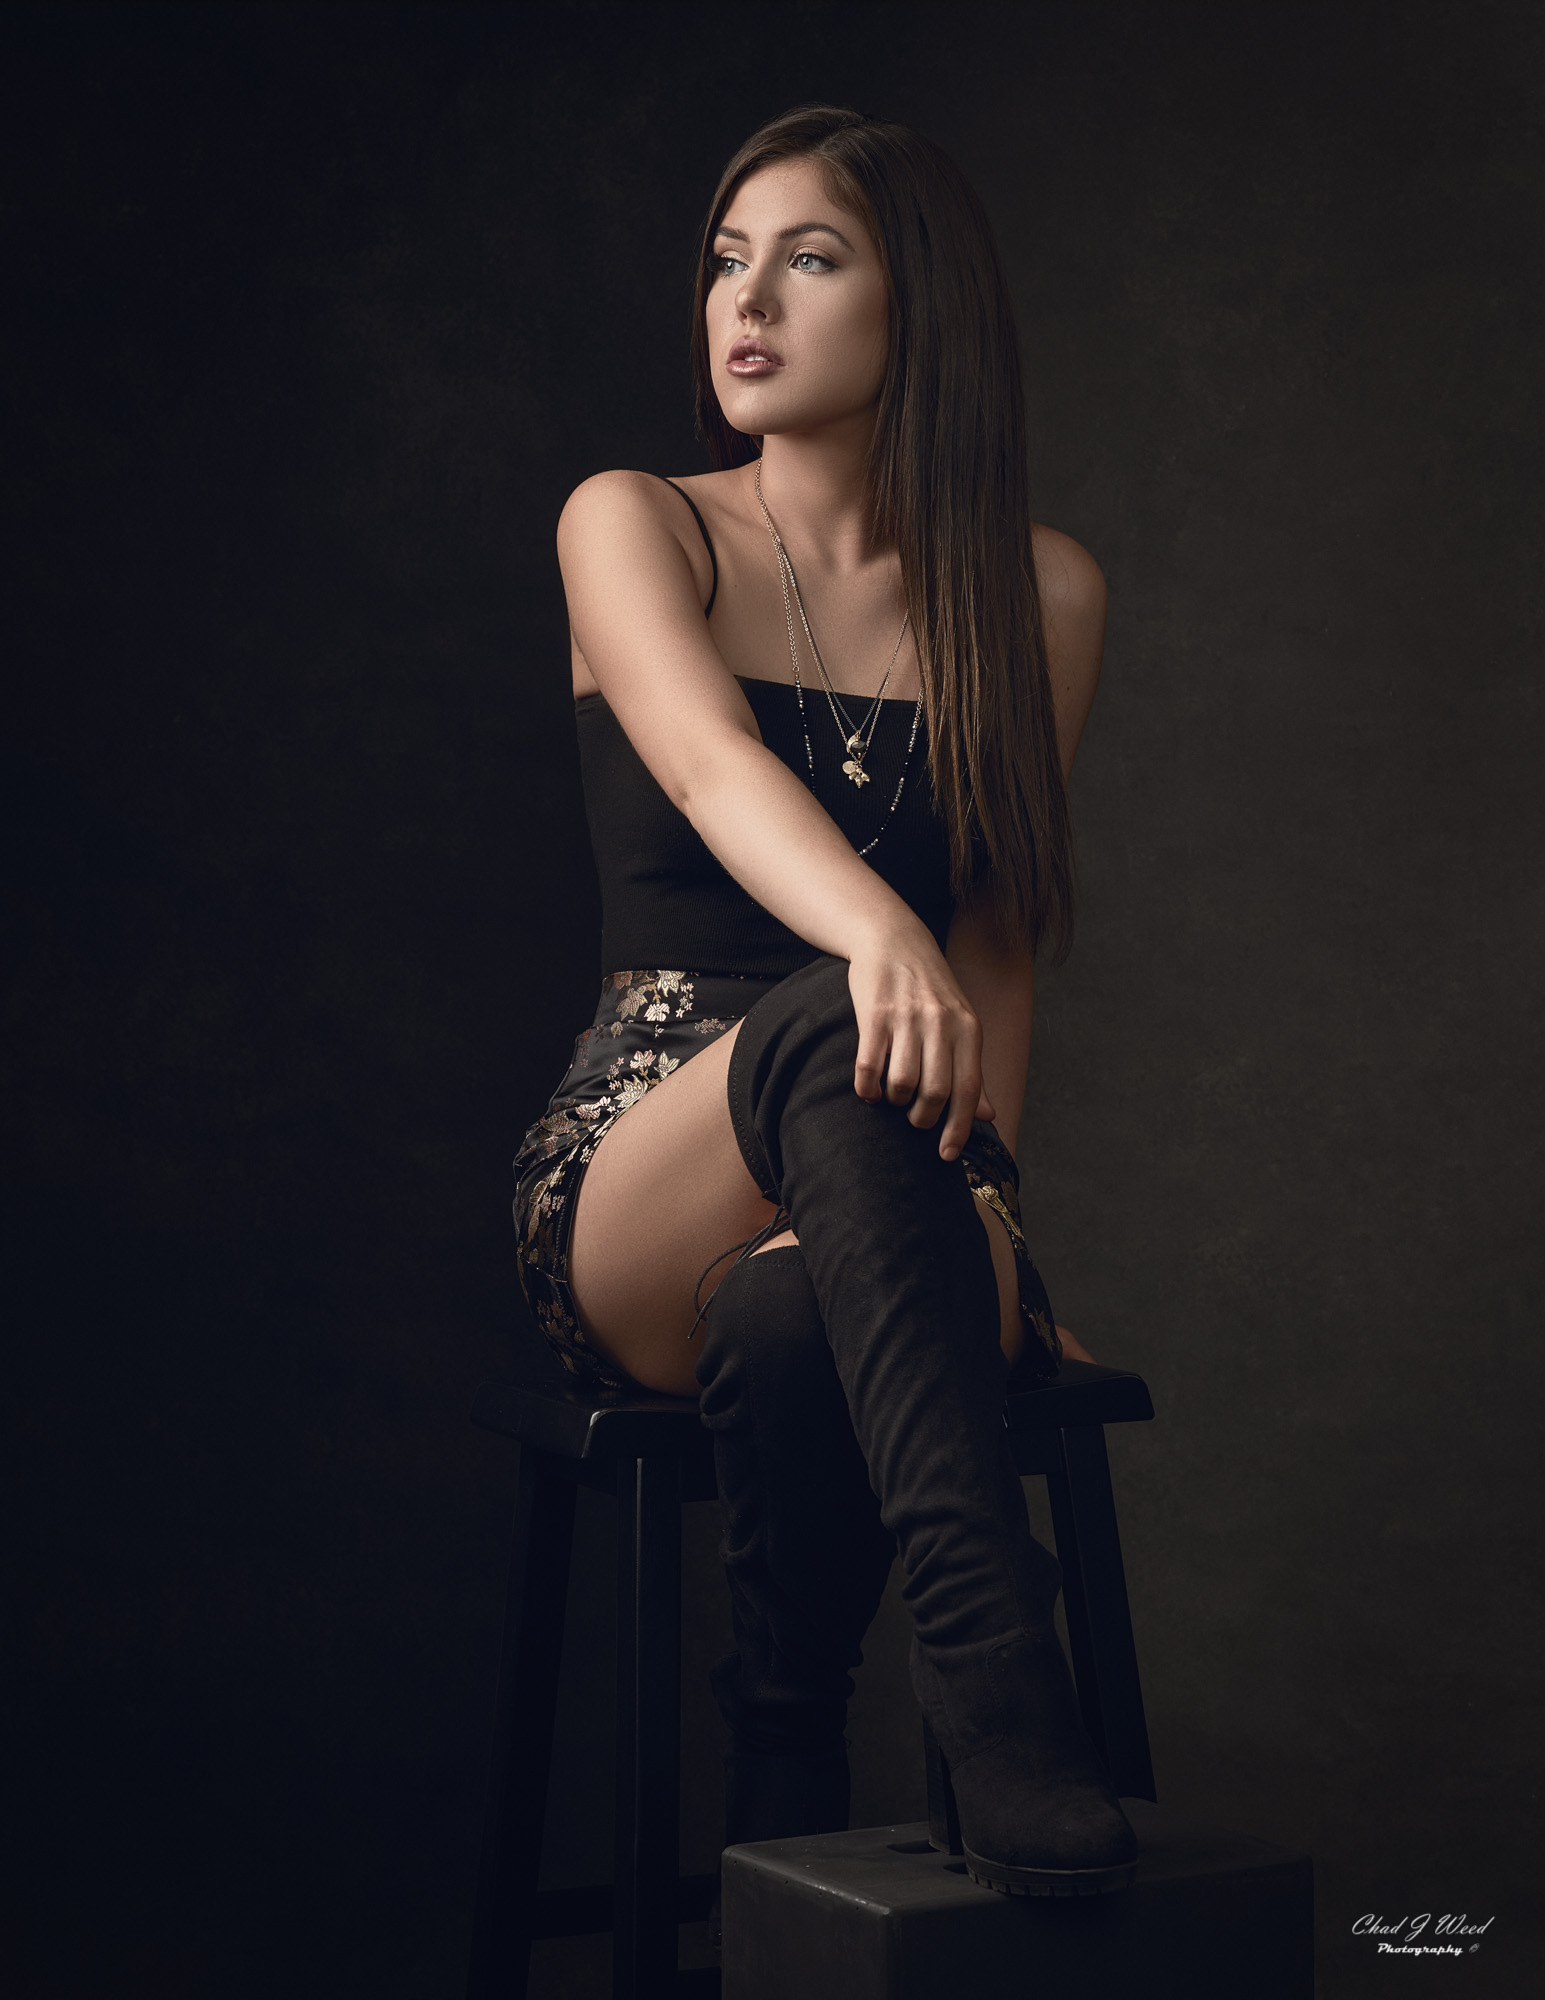 Arizona Fashion Photographer Chad Weed with Fashion Model Jasmine - Black Skirt 2